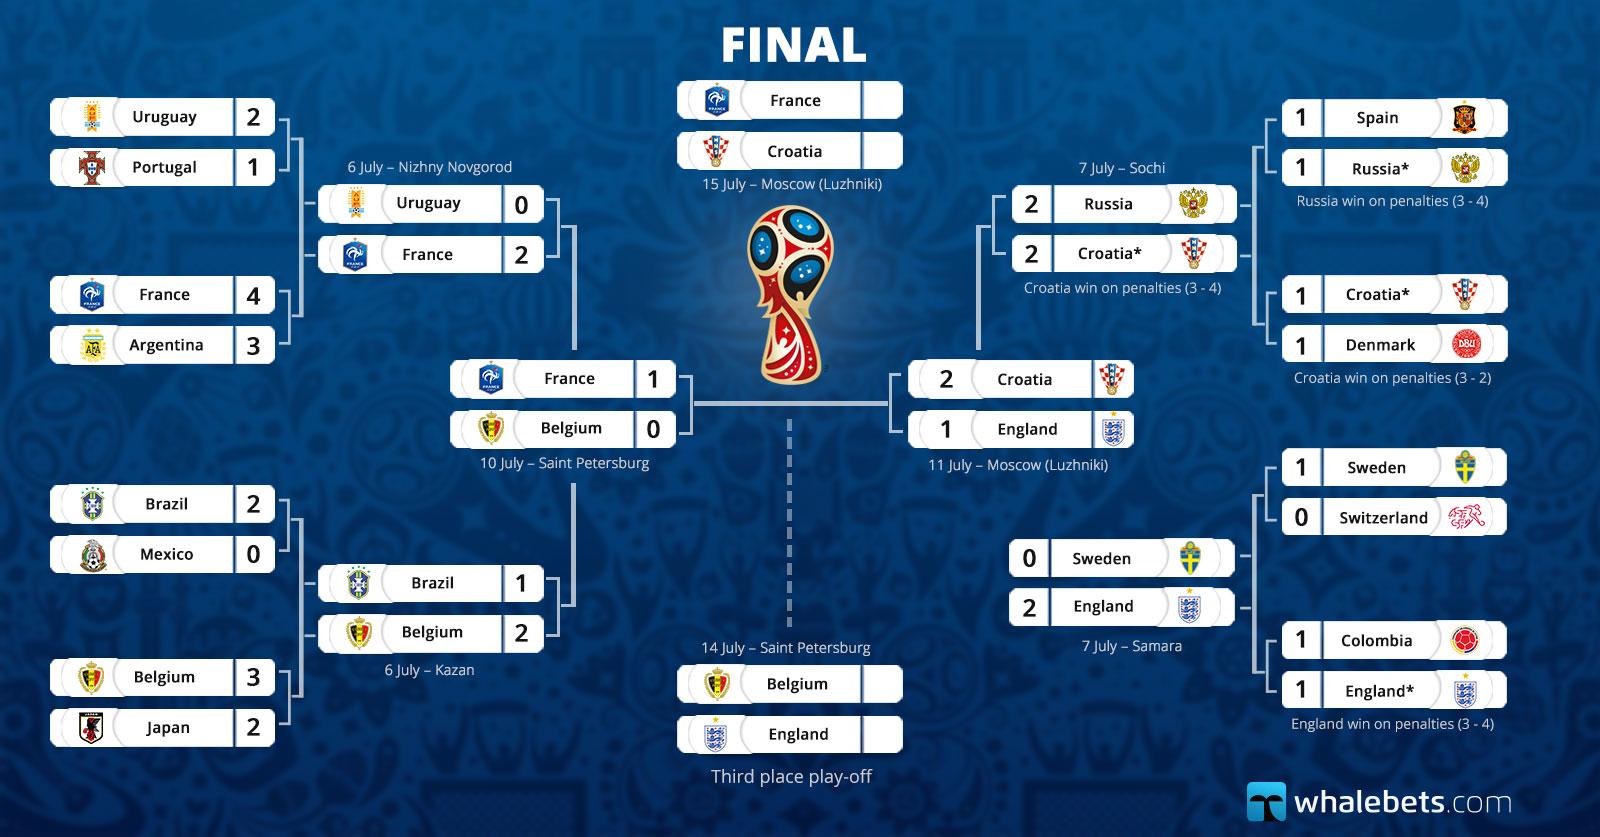 2018 Fifa World Cup Russia - Wallchart - 12 July